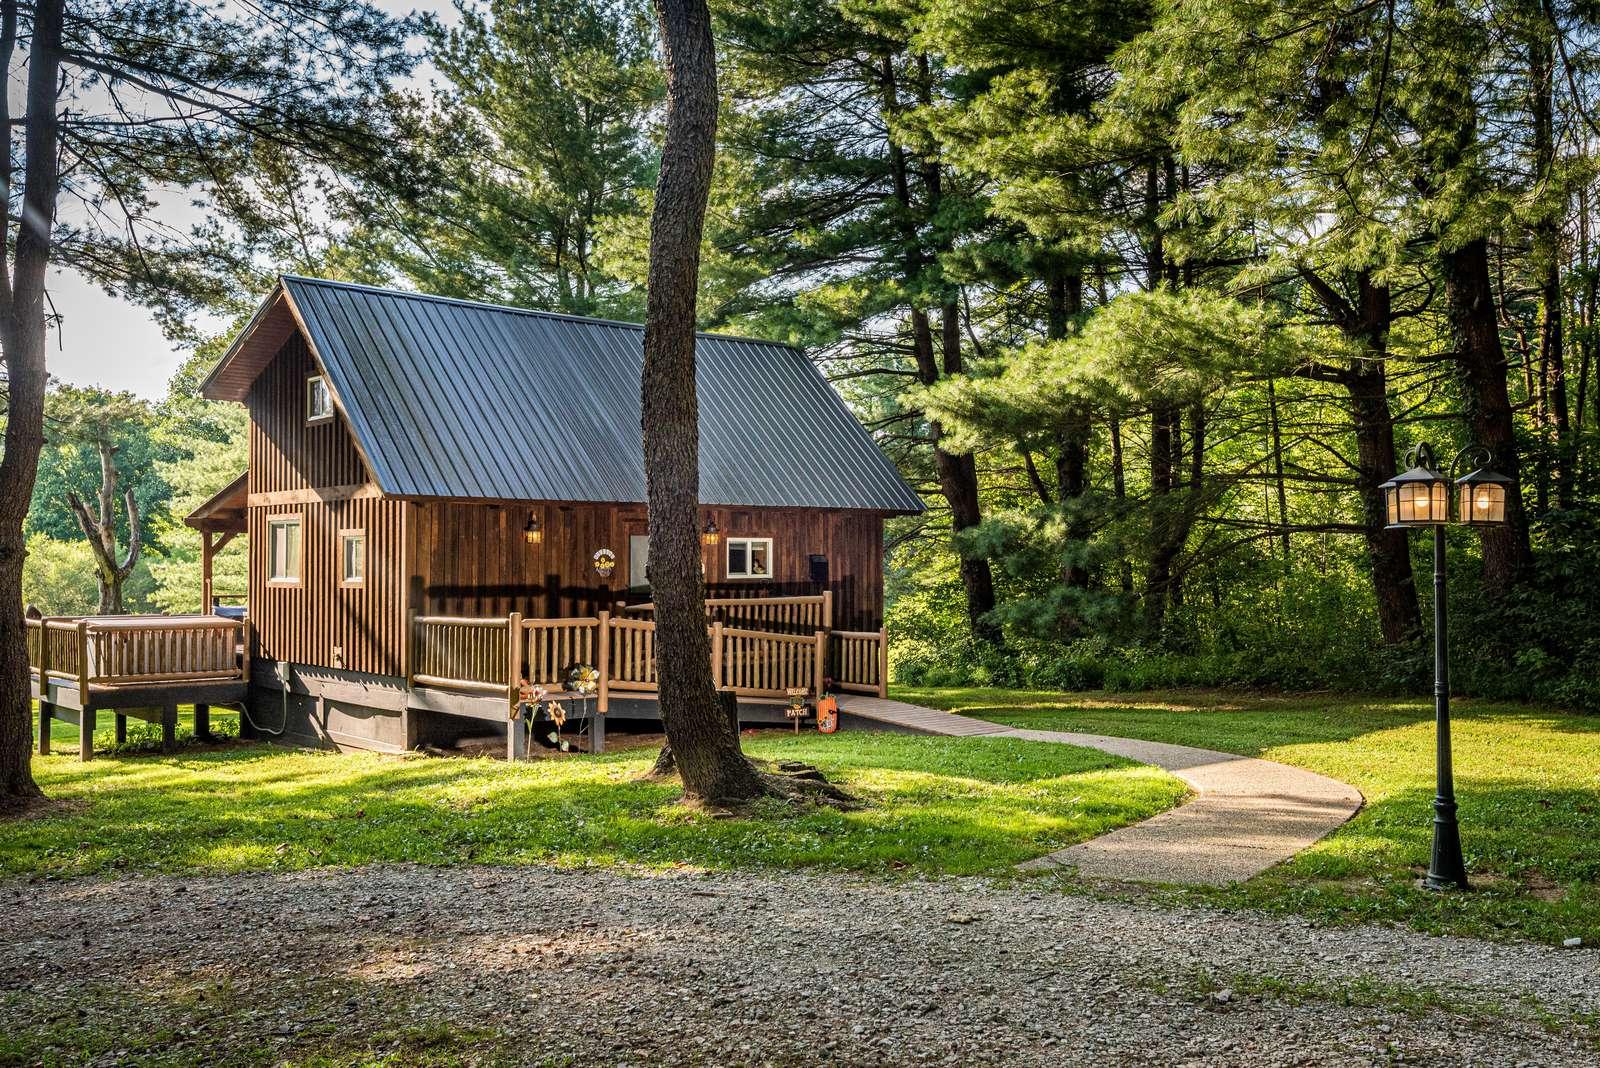 Stephen's Creek Log Cabin - property